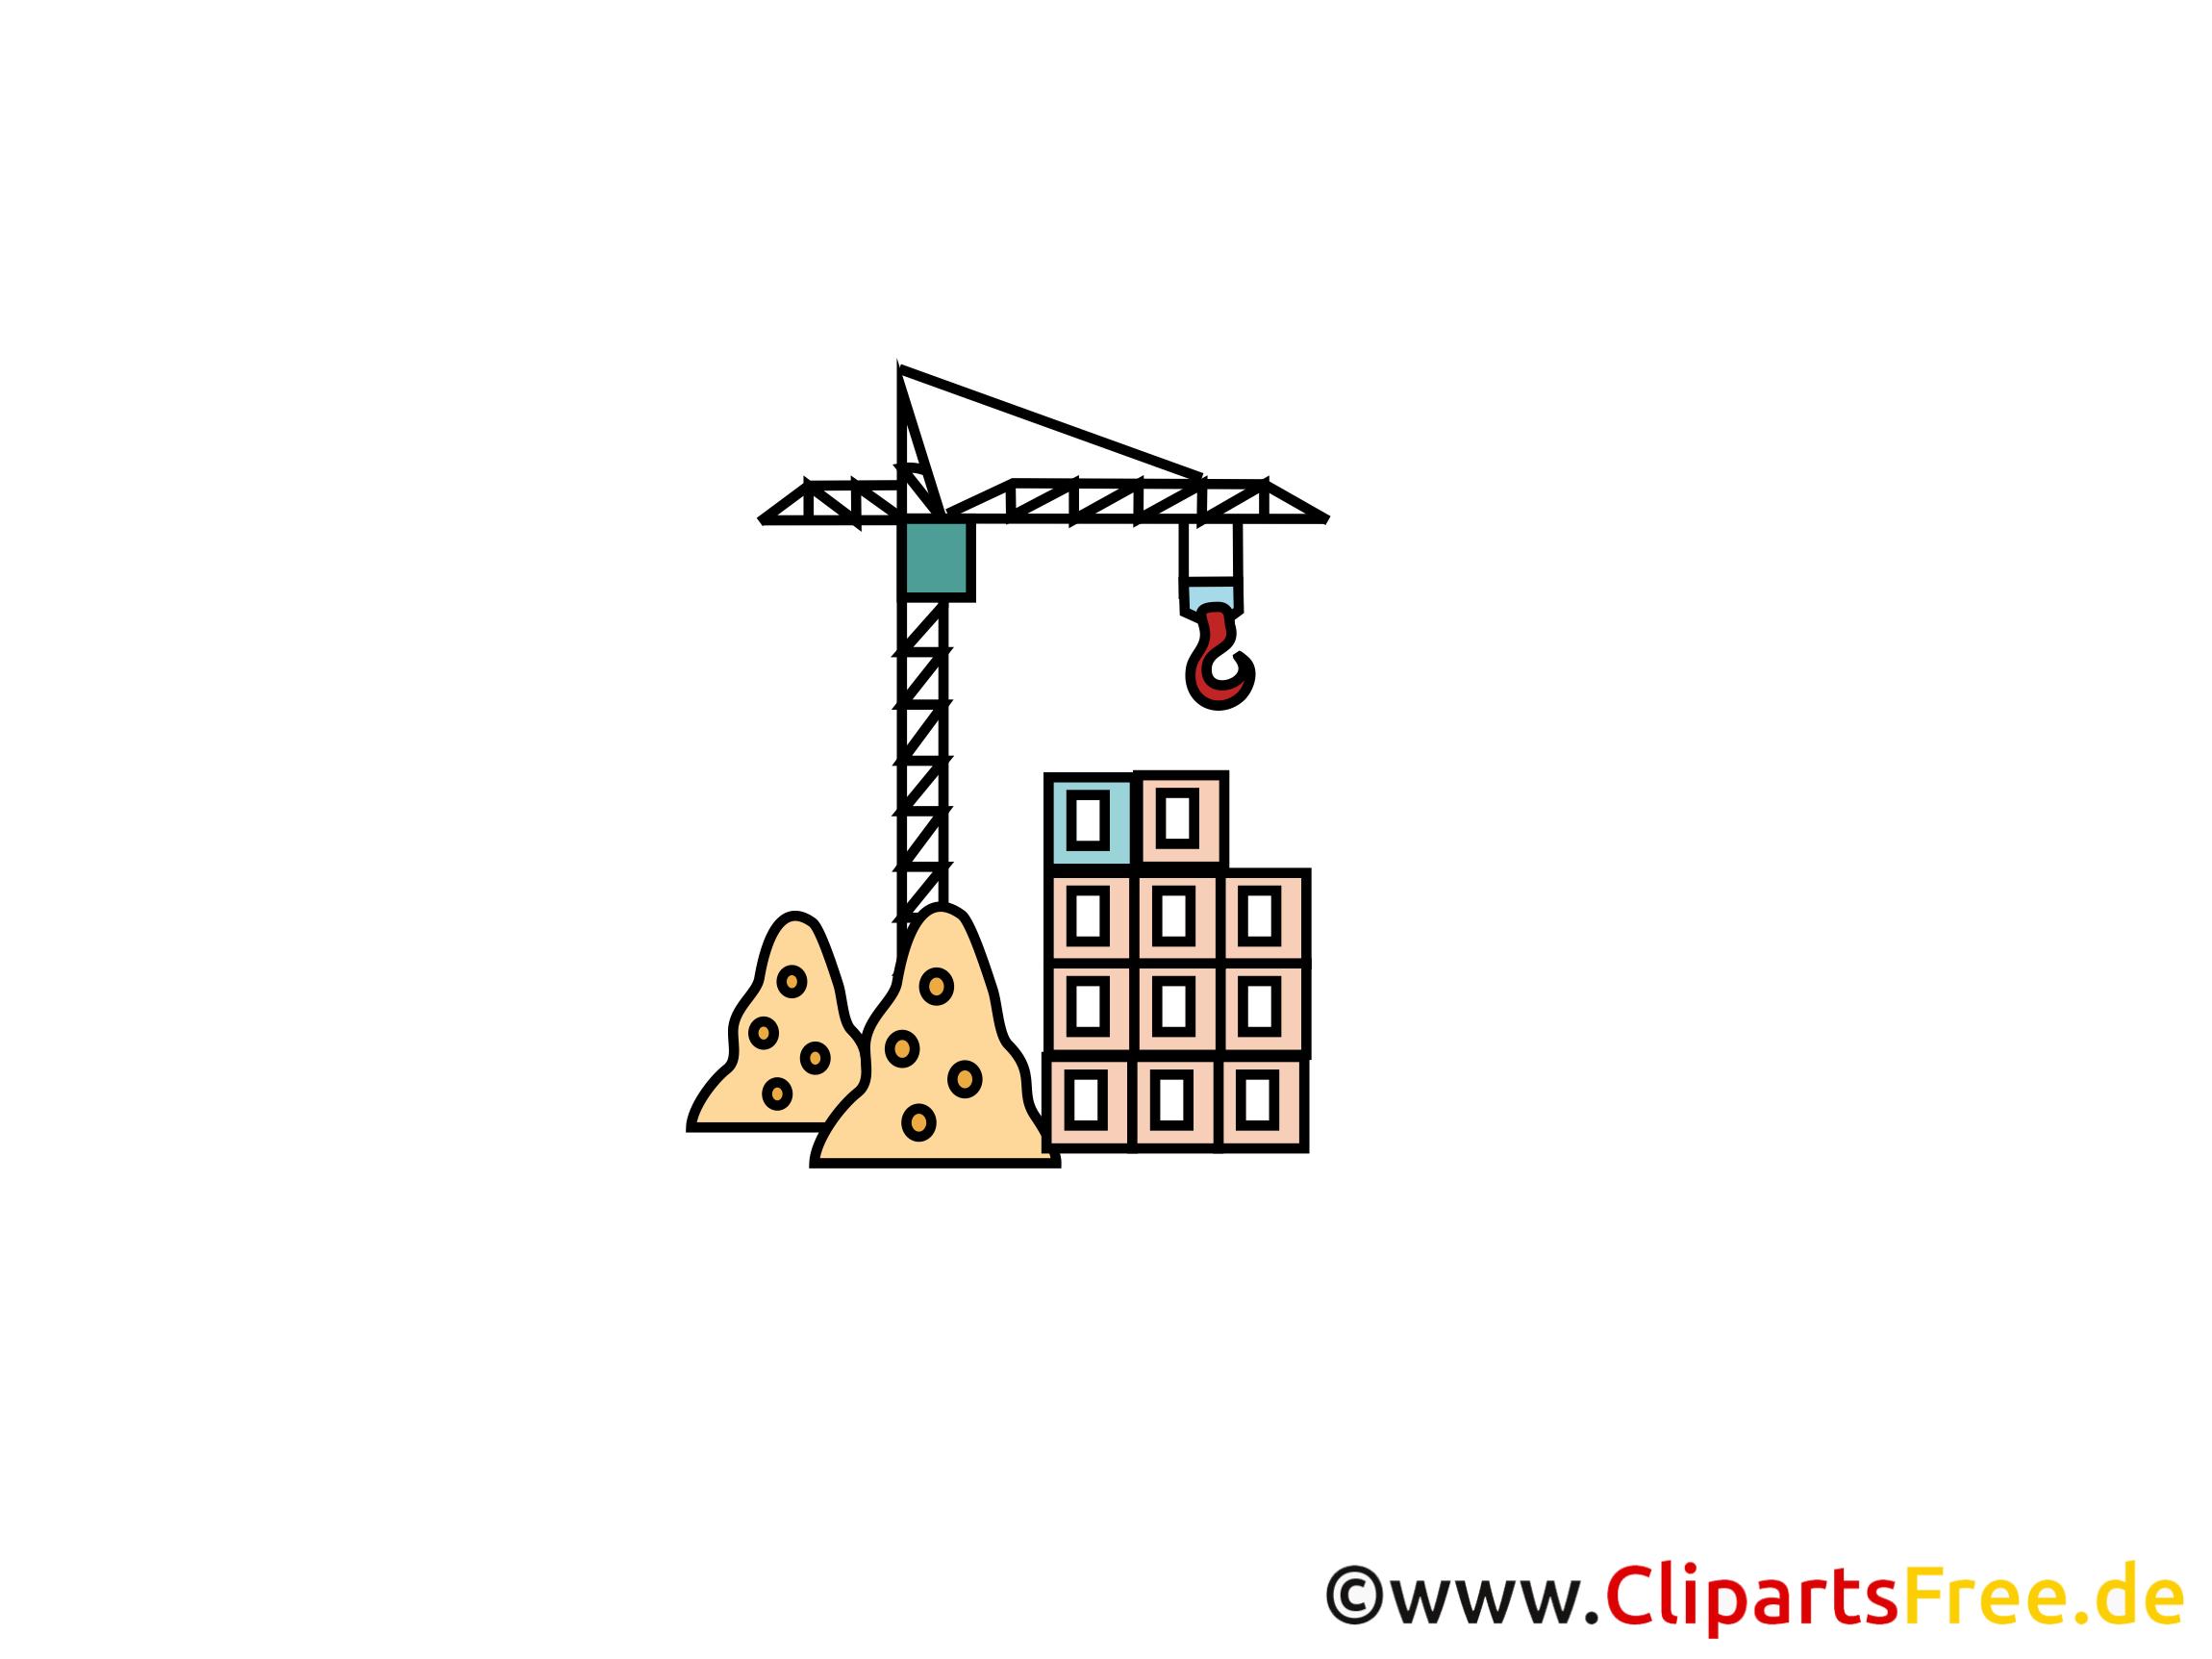 Baukran Clipart, Bild, Cartoon, Grafik gratis